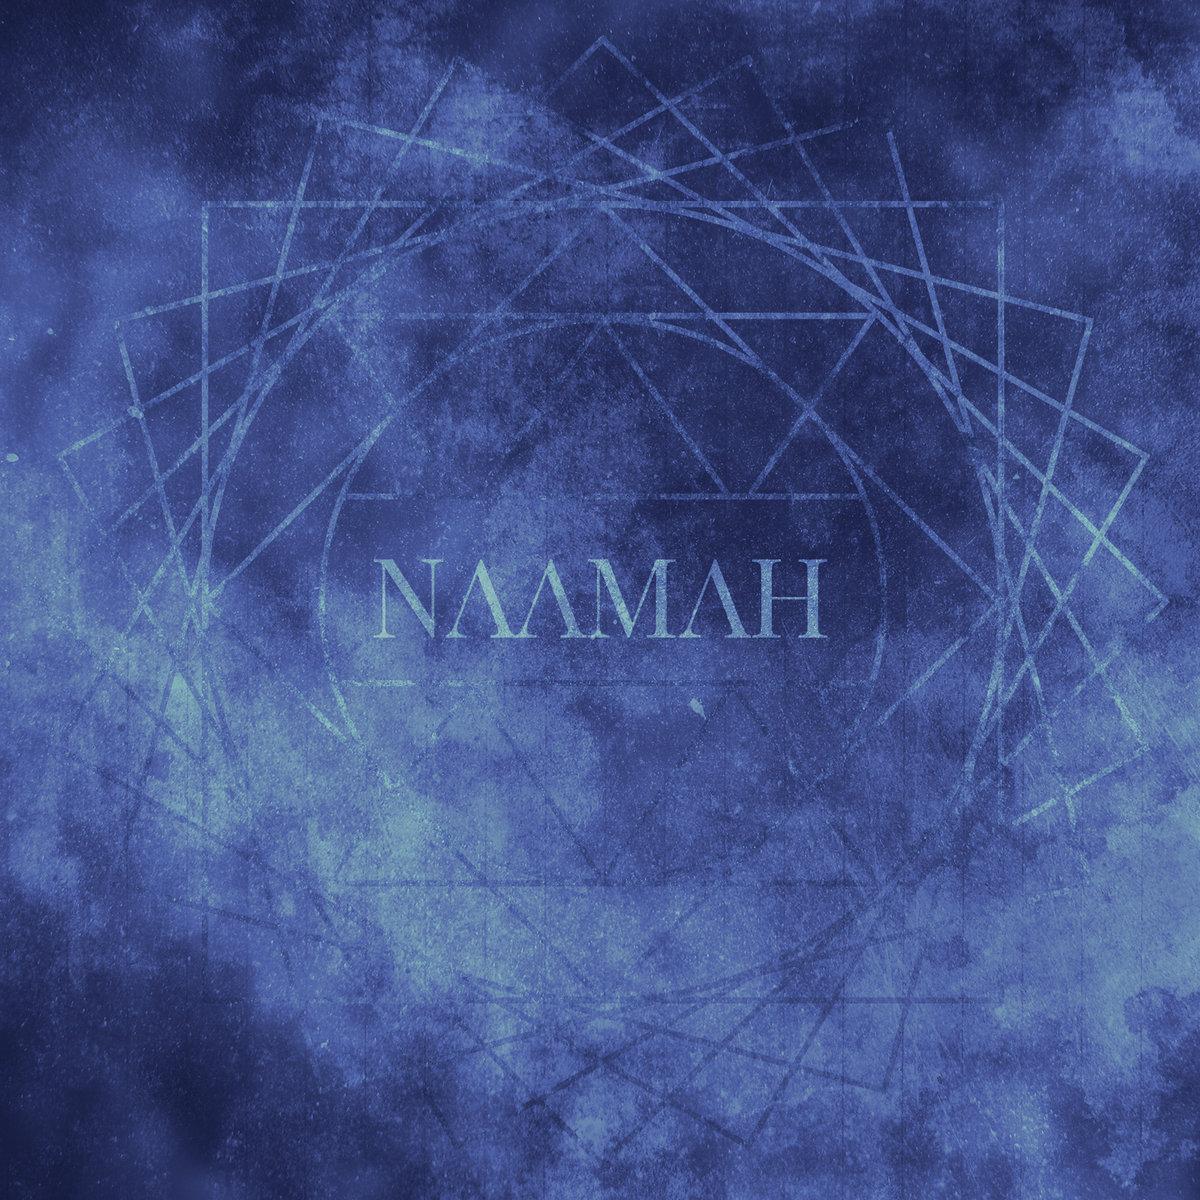 https://naamahfrance.bandcamp.com/releases